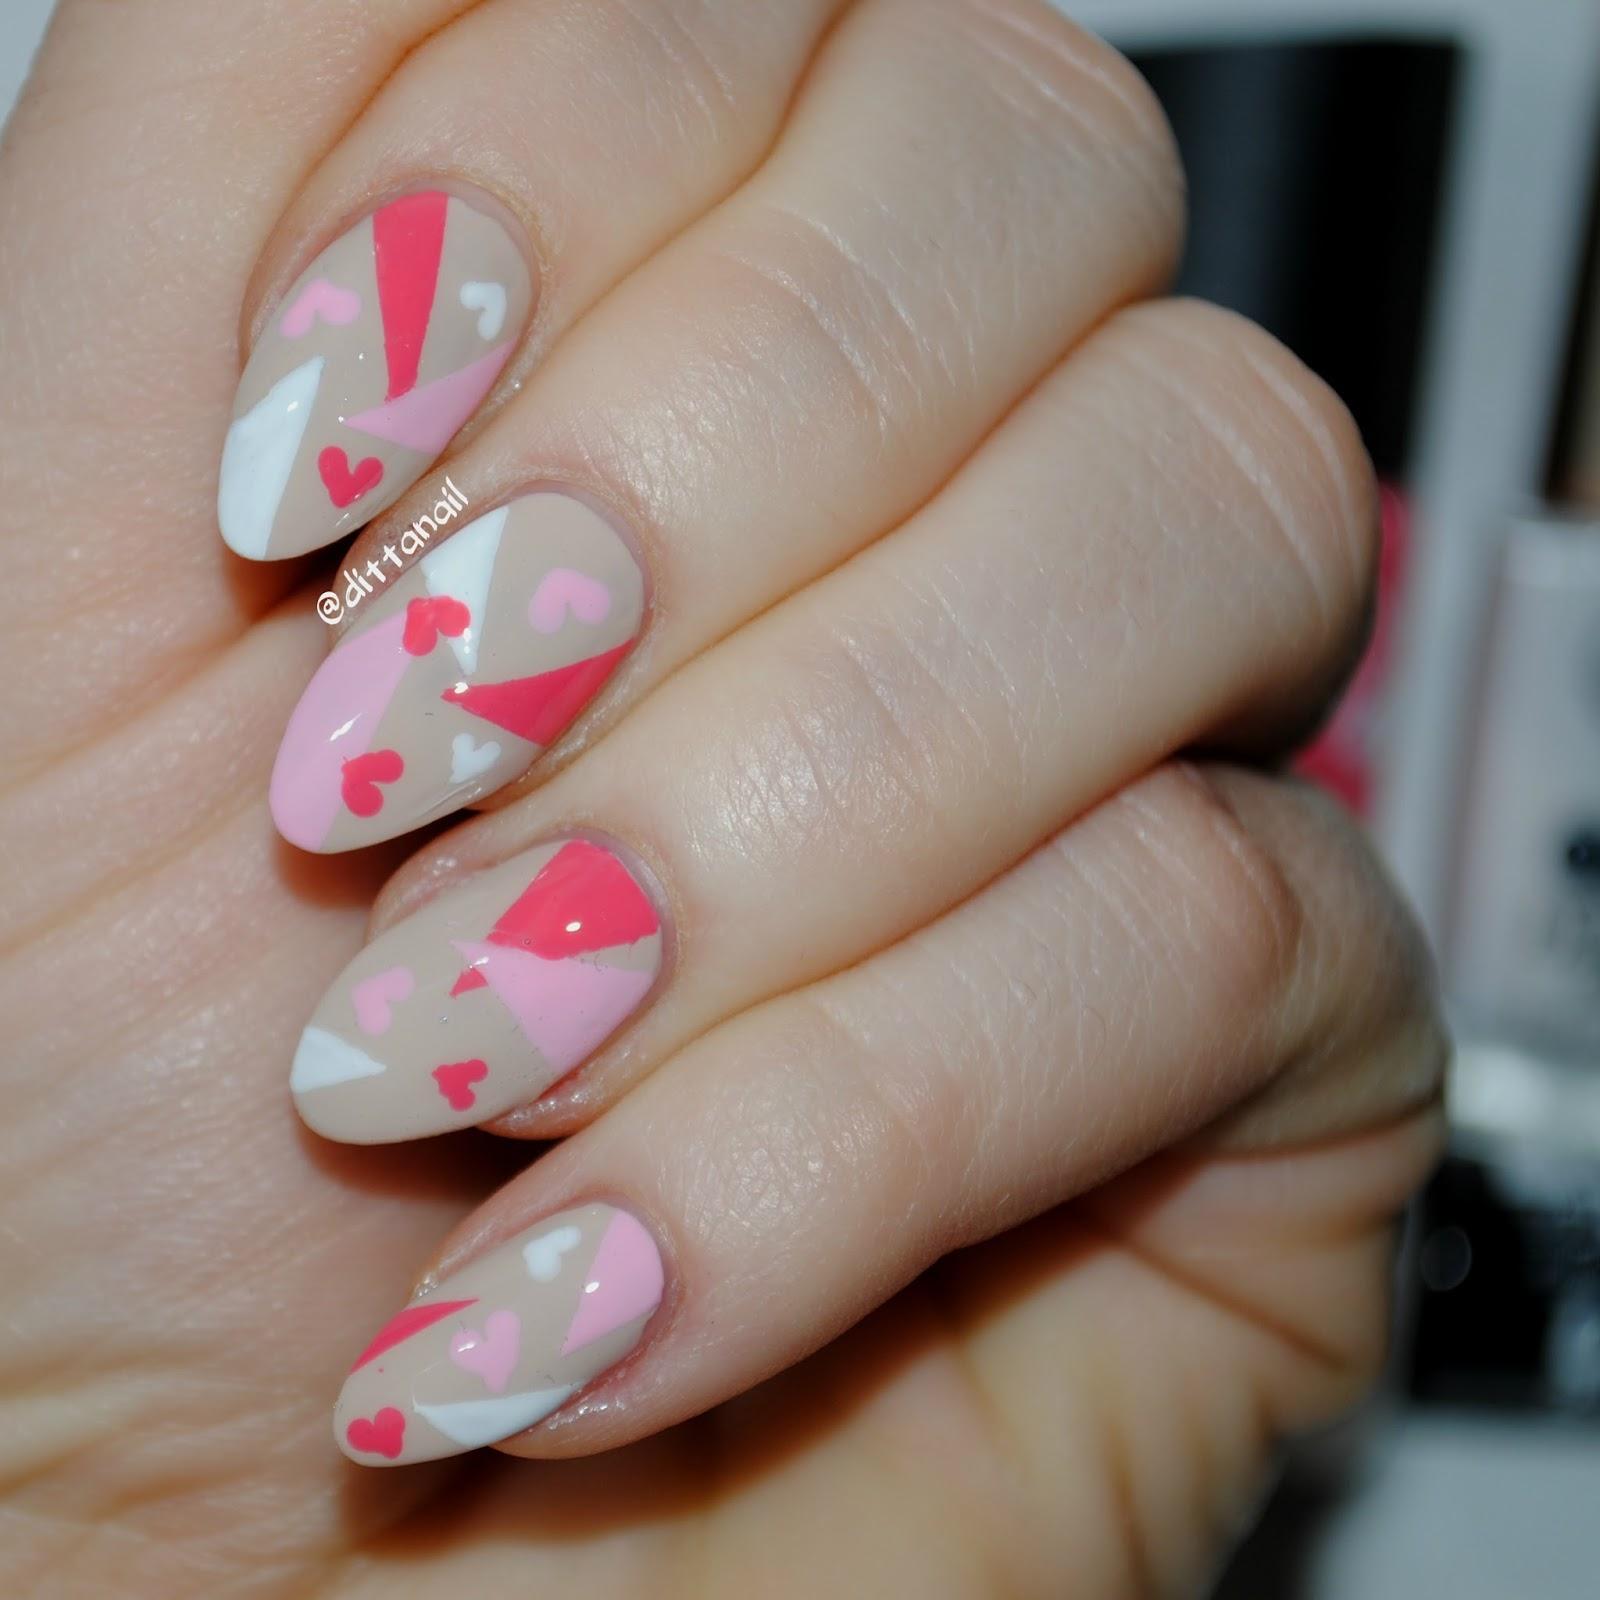 Nail Art February Challenge: Ditta's Nail Design & Art : February's Nails Challenge